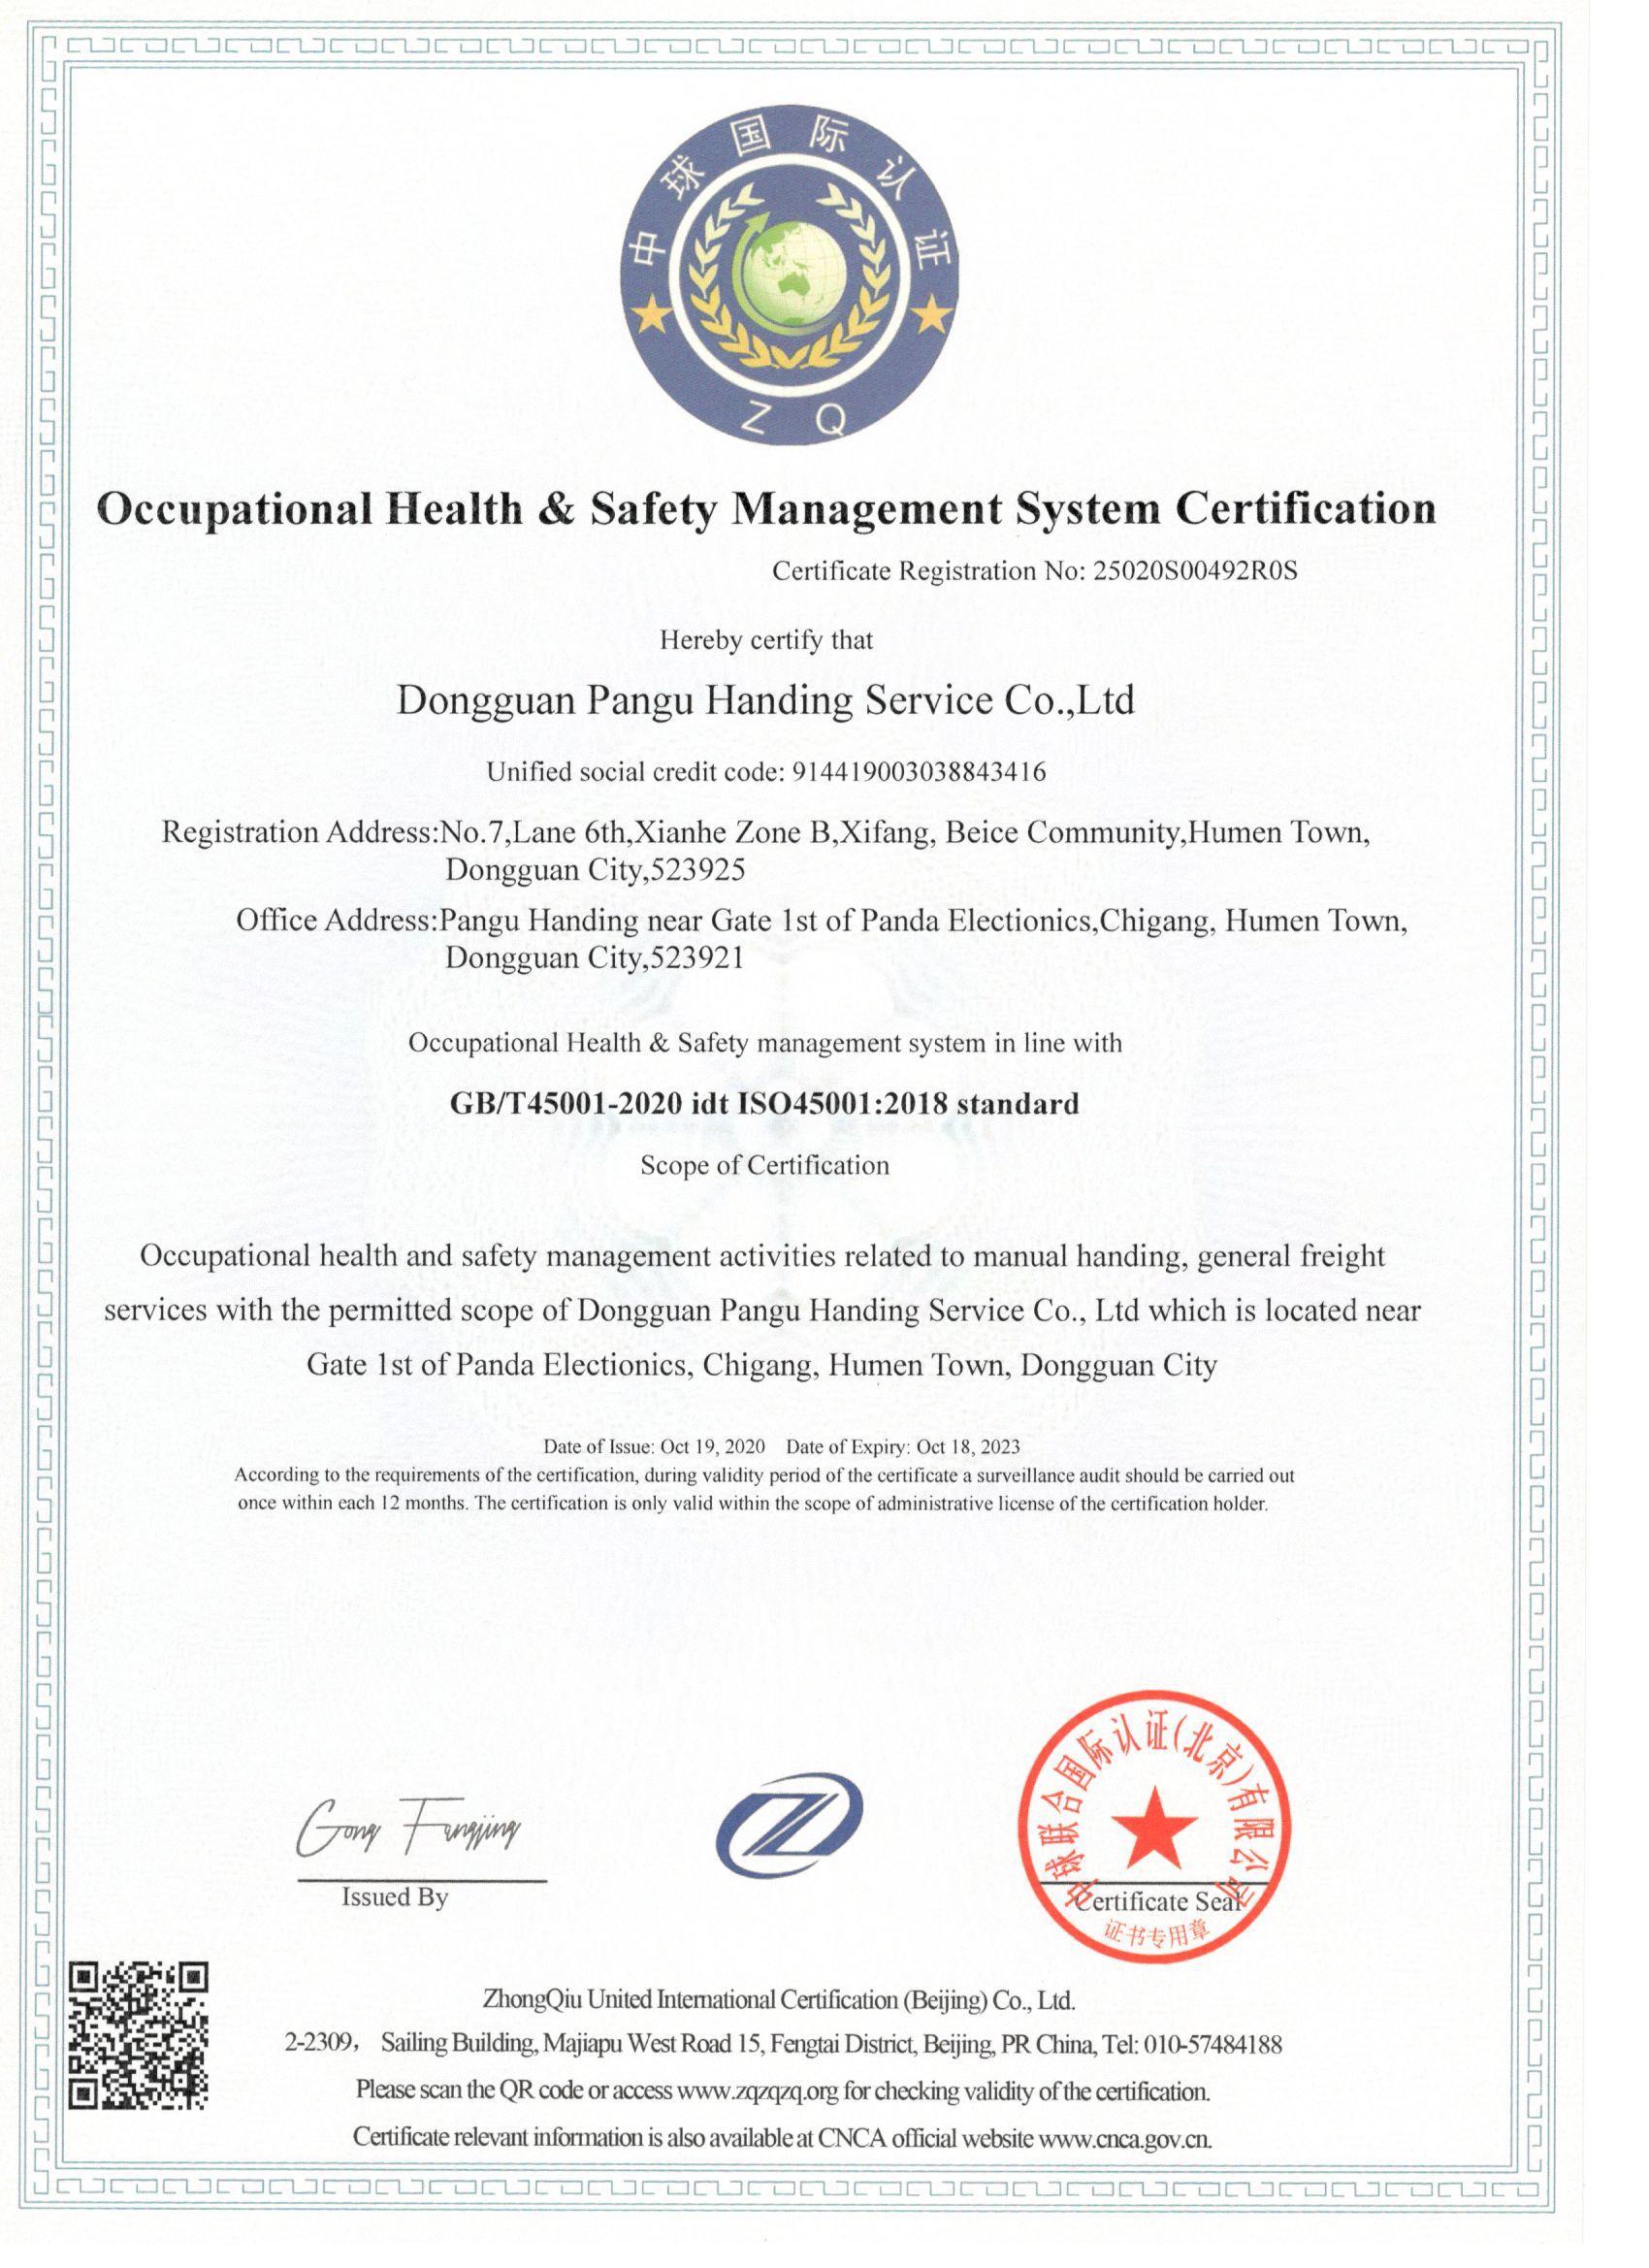 Occupational Health & Safety Management System Certification认证-东莞市盘古搬运服